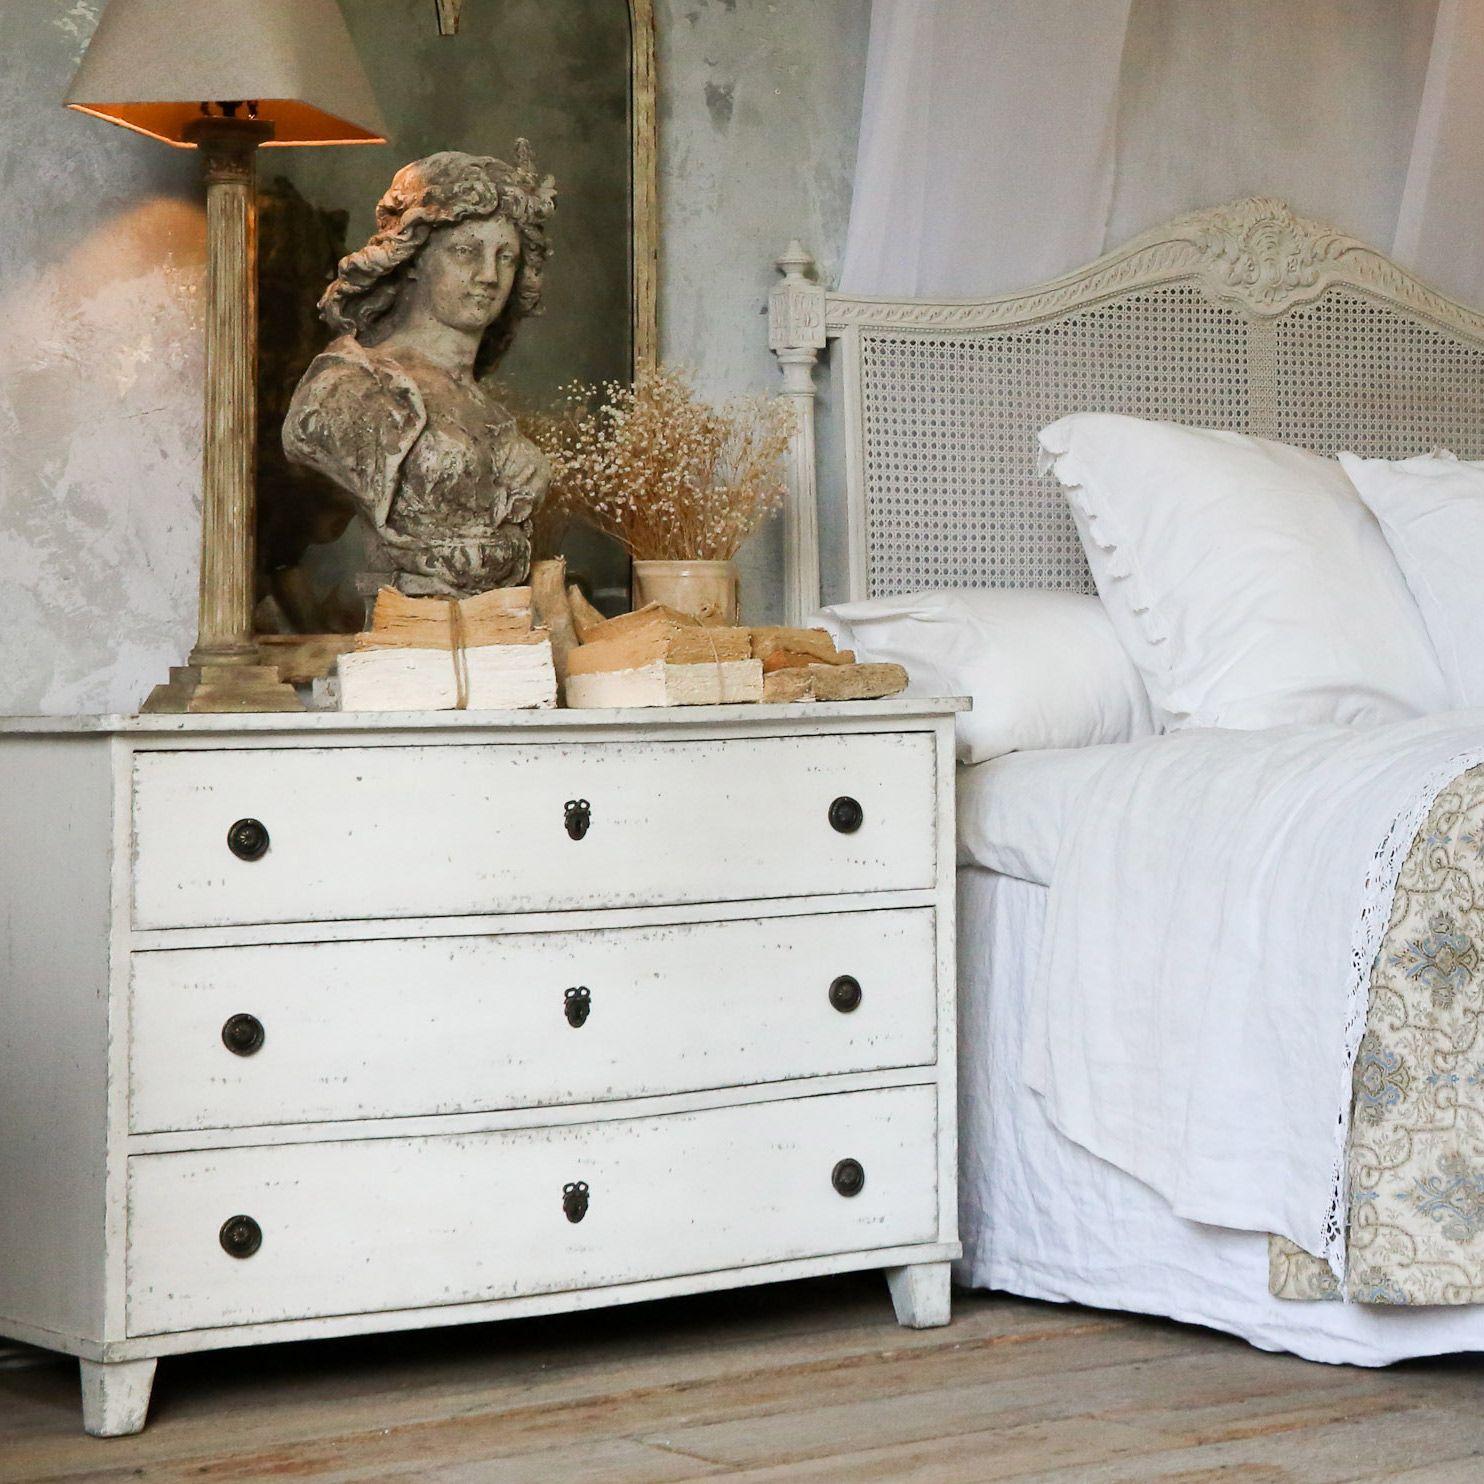 Swedish bedroom decor. Gustavus dresser. Swedish decor inspiration, French and Gustavian Design Style from Eloquence. #swedish #interiordesign #frenchcountry #gustavian #nordic #decoratingideas #whitedecor #eloquence #furniture